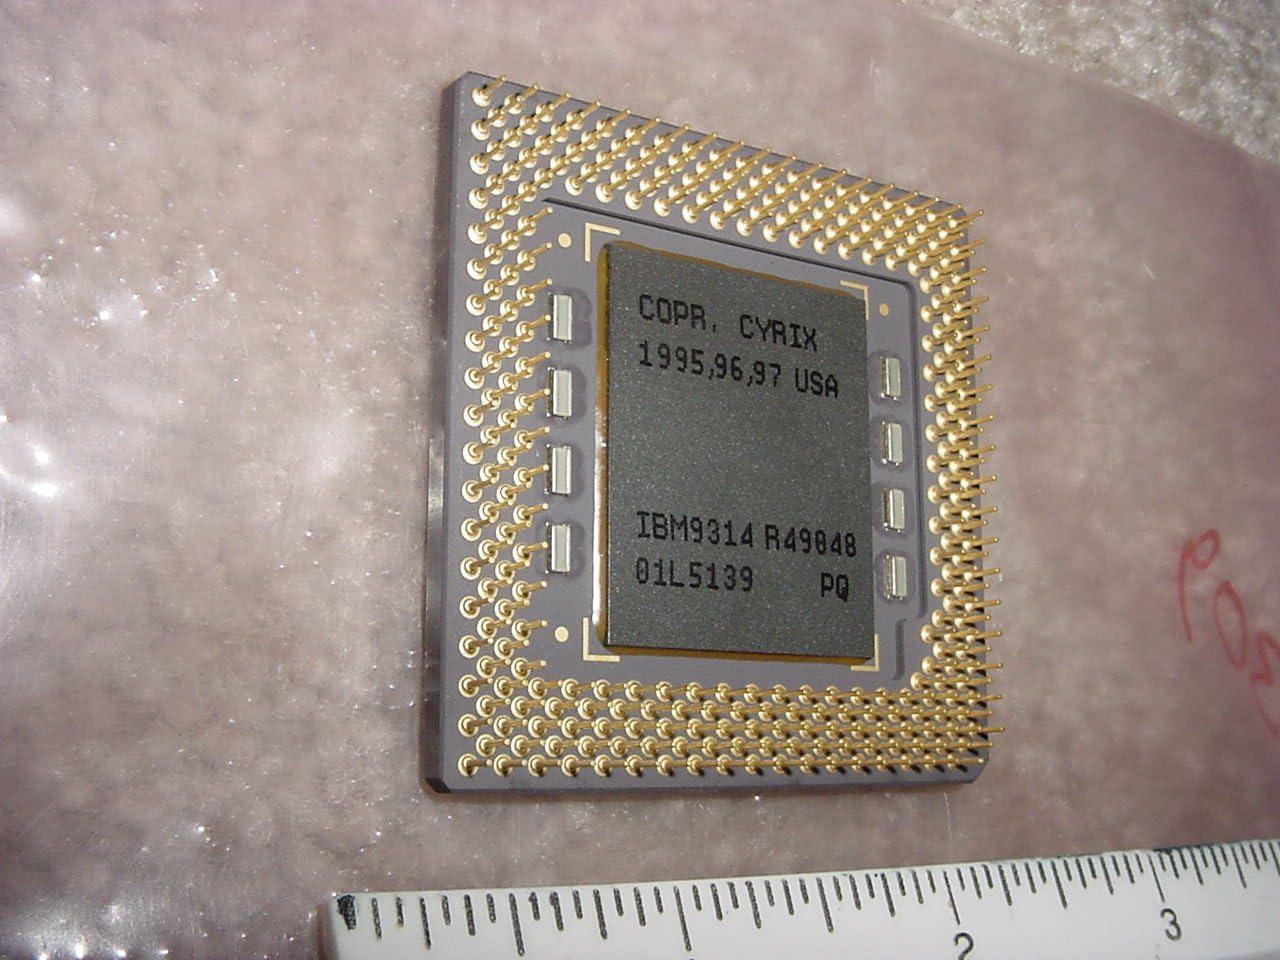 6x86L-PR166+GP 133MHz Cyrix